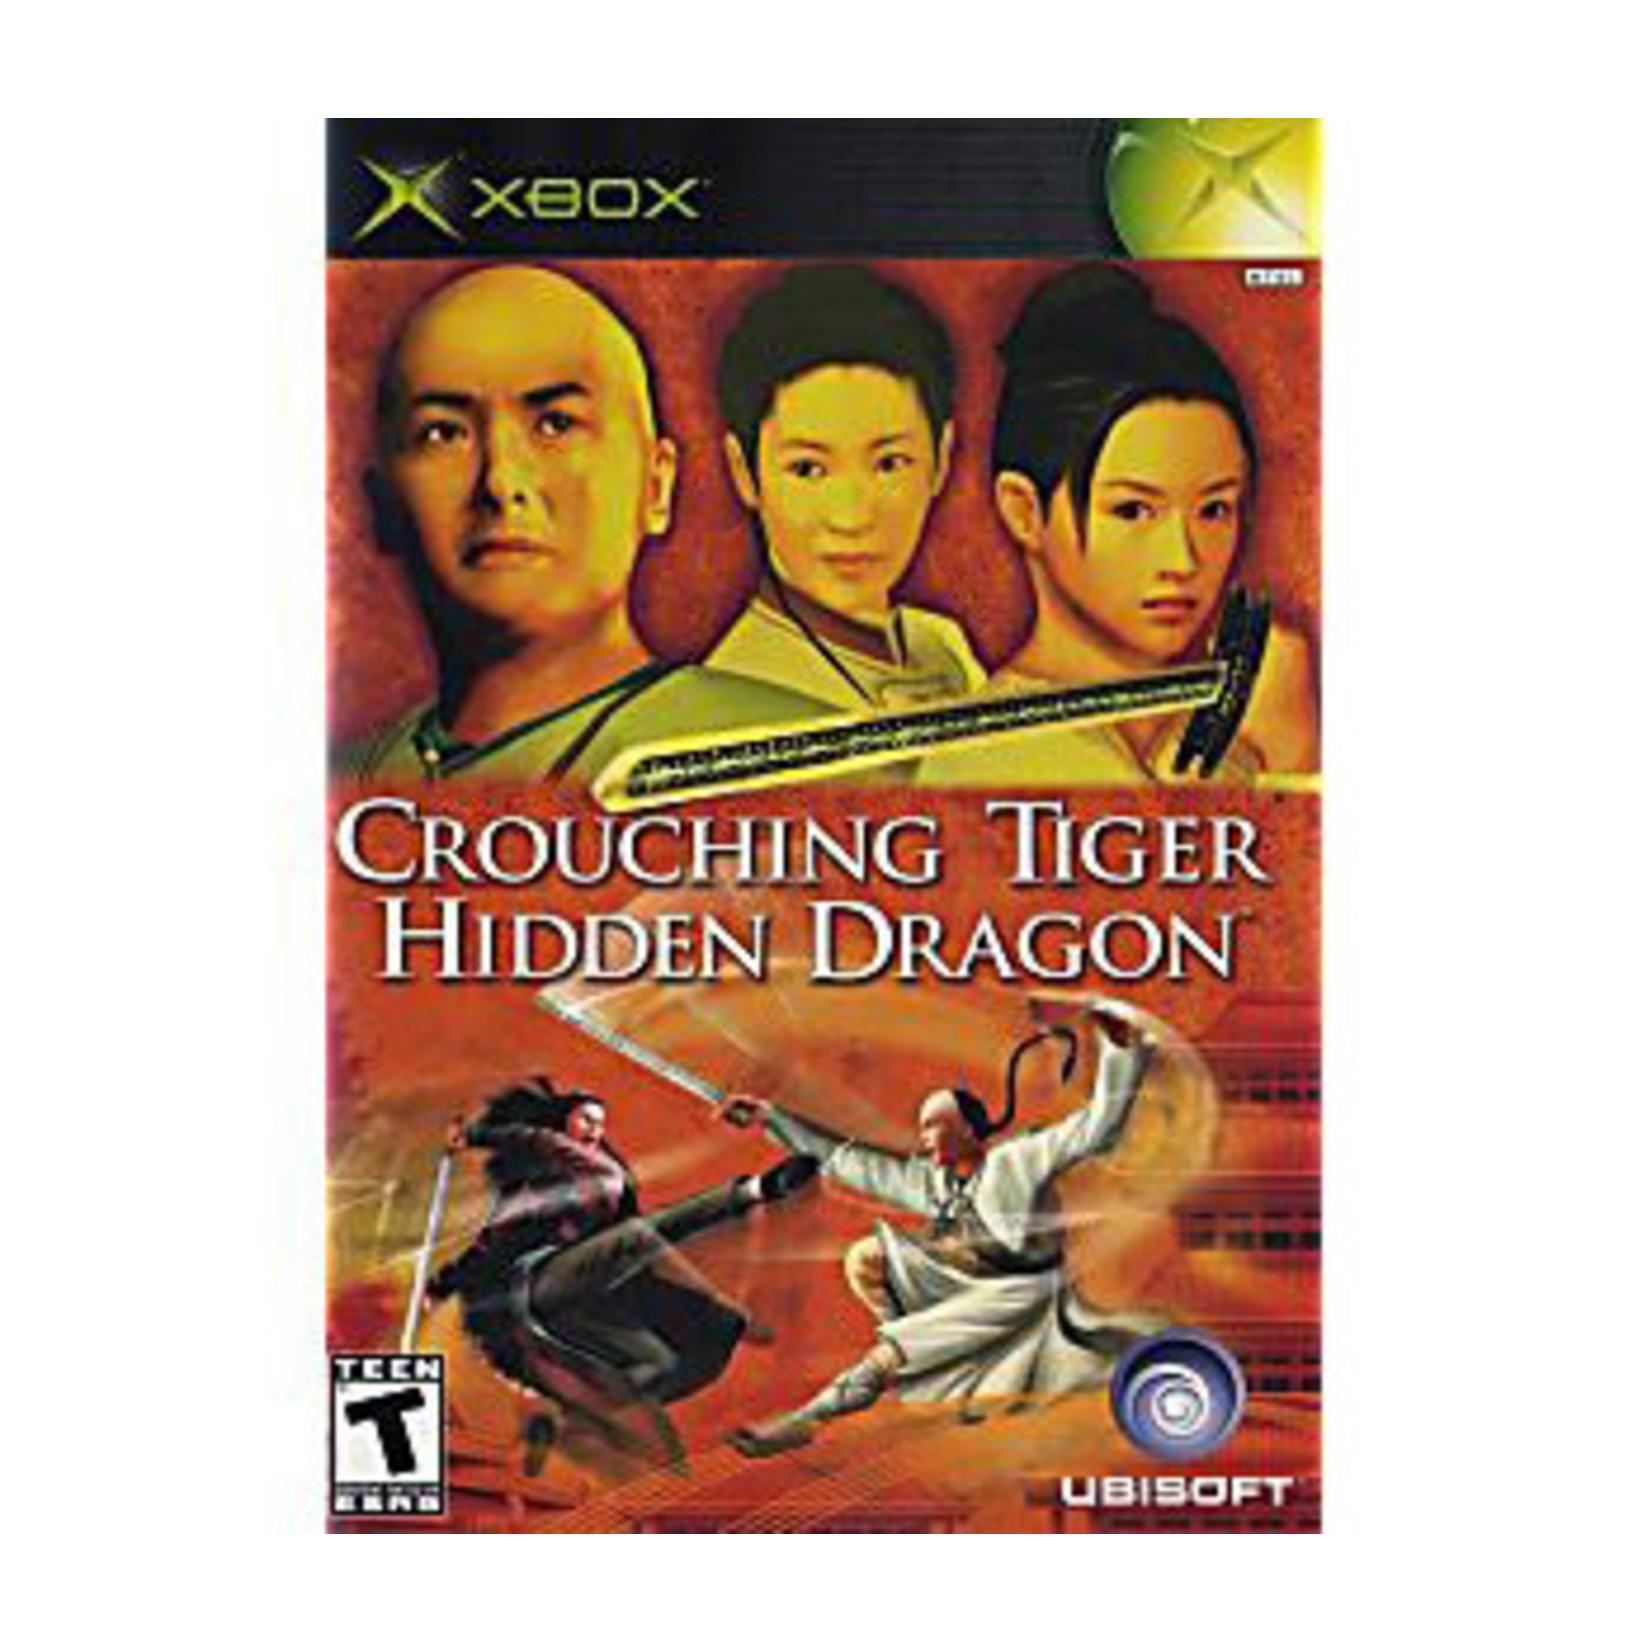 XBU-CROUCHING TIGER HIDDEN DRAGON